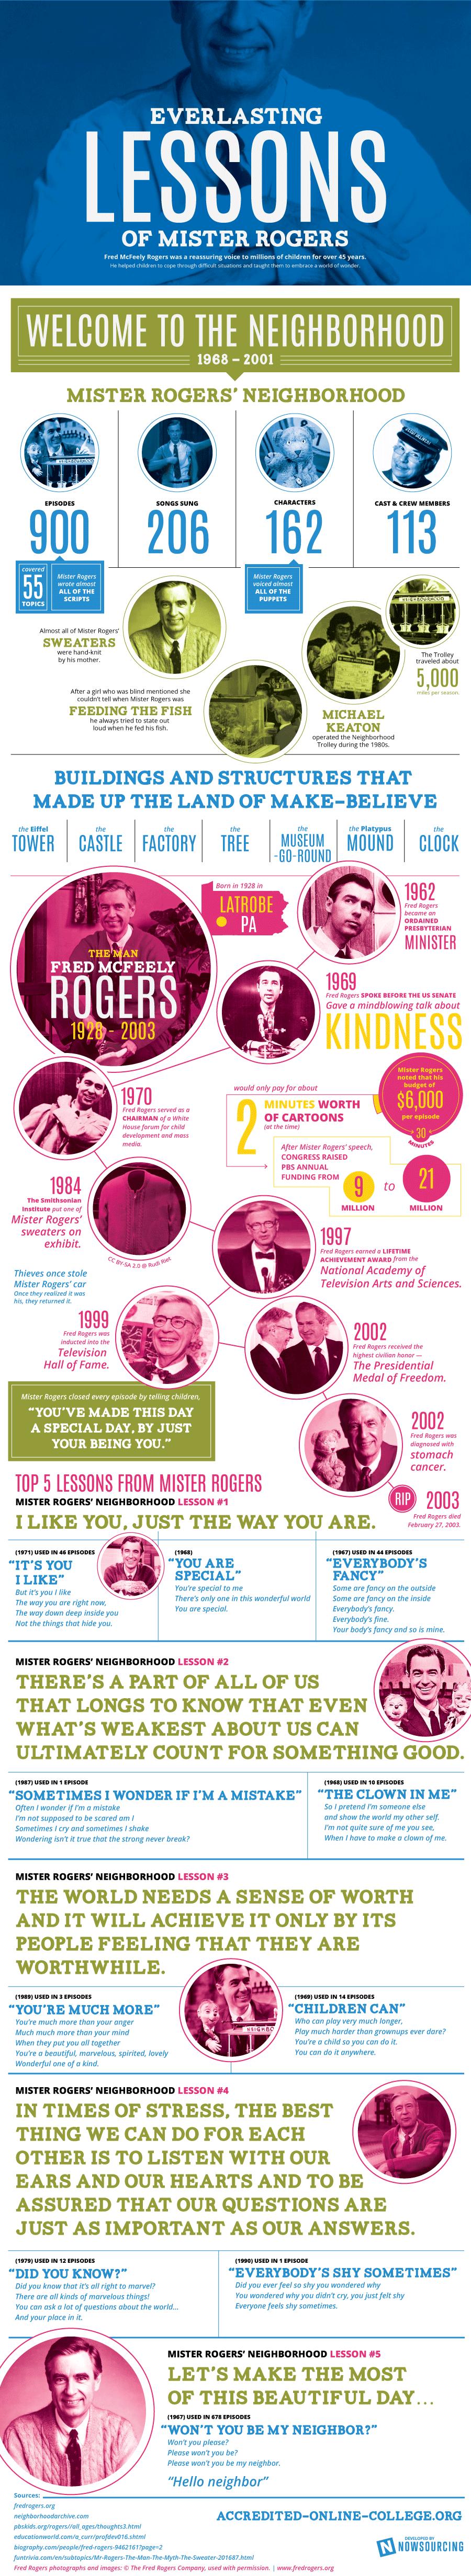 Everlasting Lessons of Mister Rogers